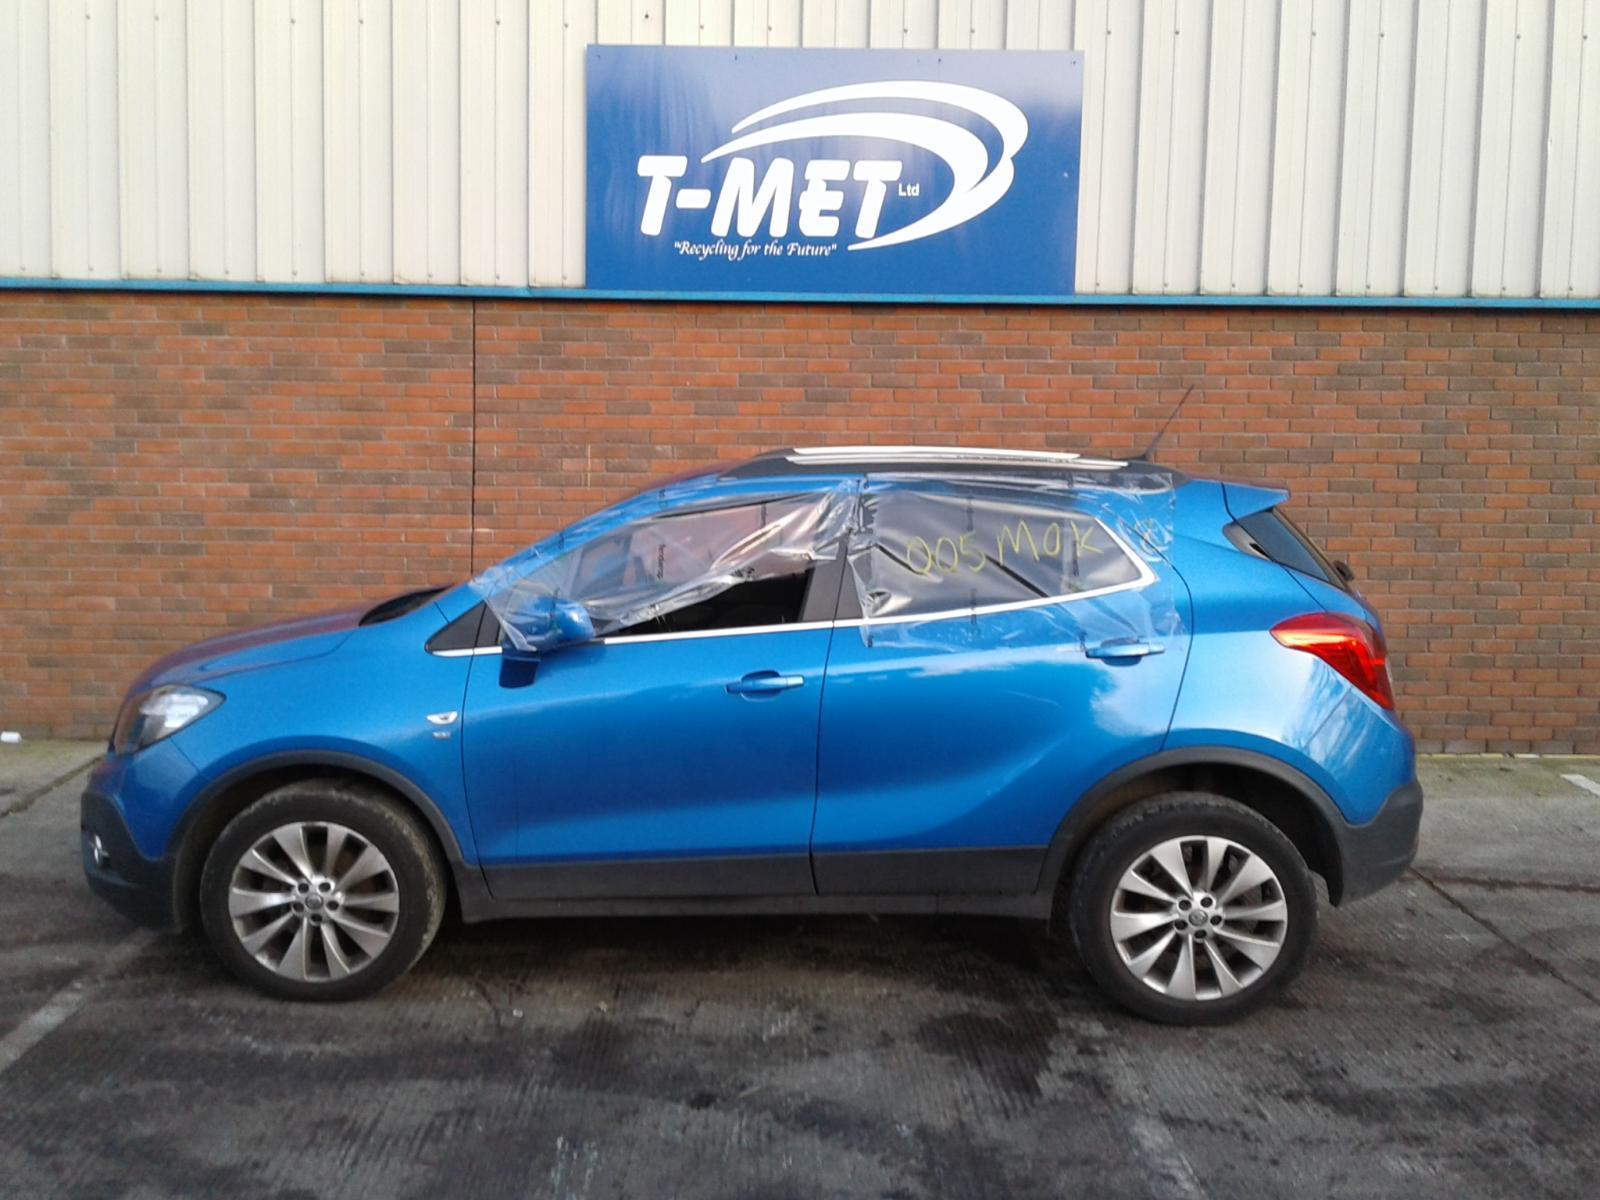 2016 Vauxhall MOKKA SE CDTI Image